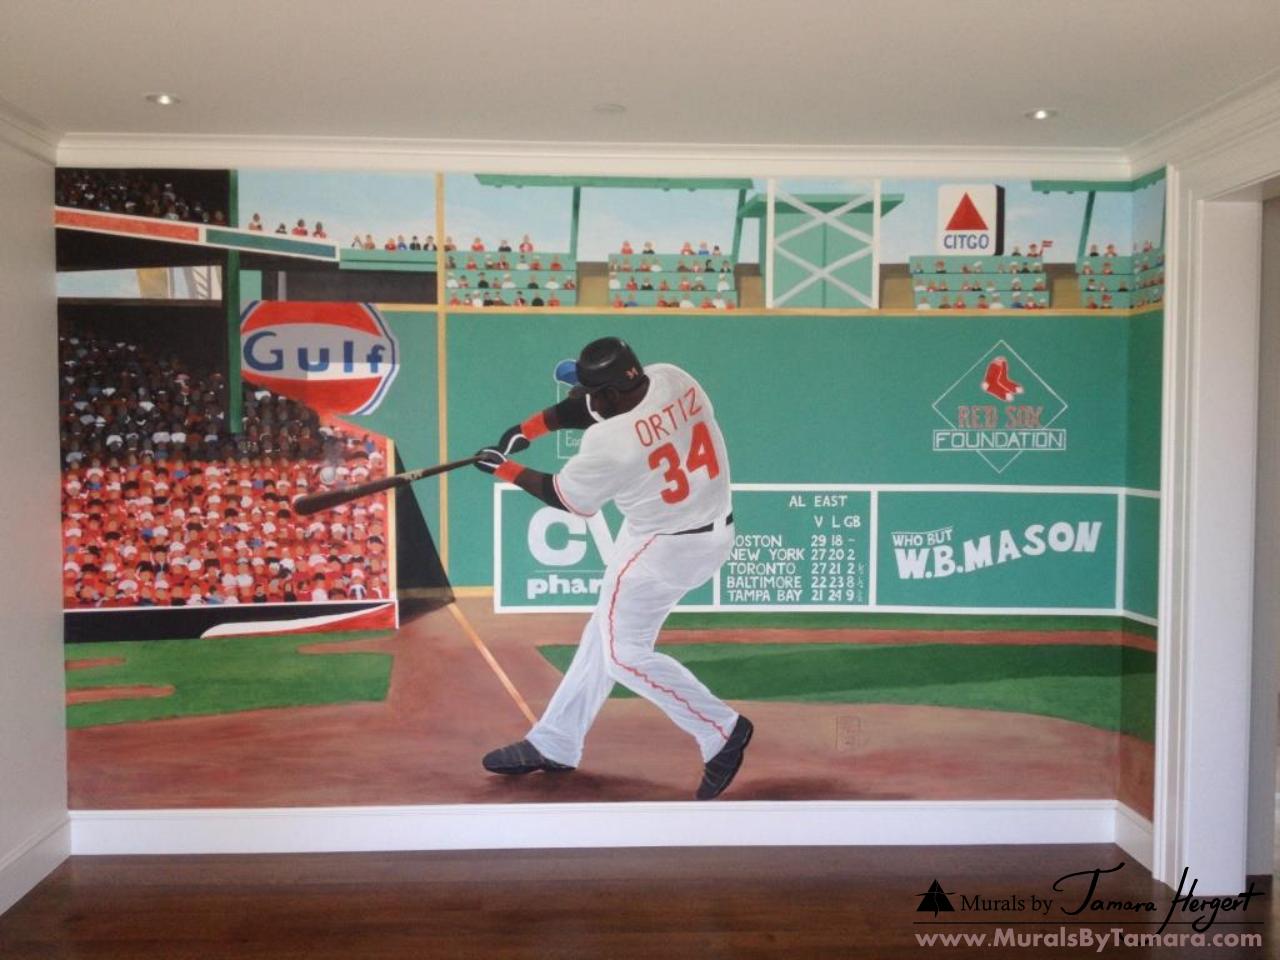 Fenway park Green monster wall with David Ortiz Red Sox - kids room mural by Tamara Hergert